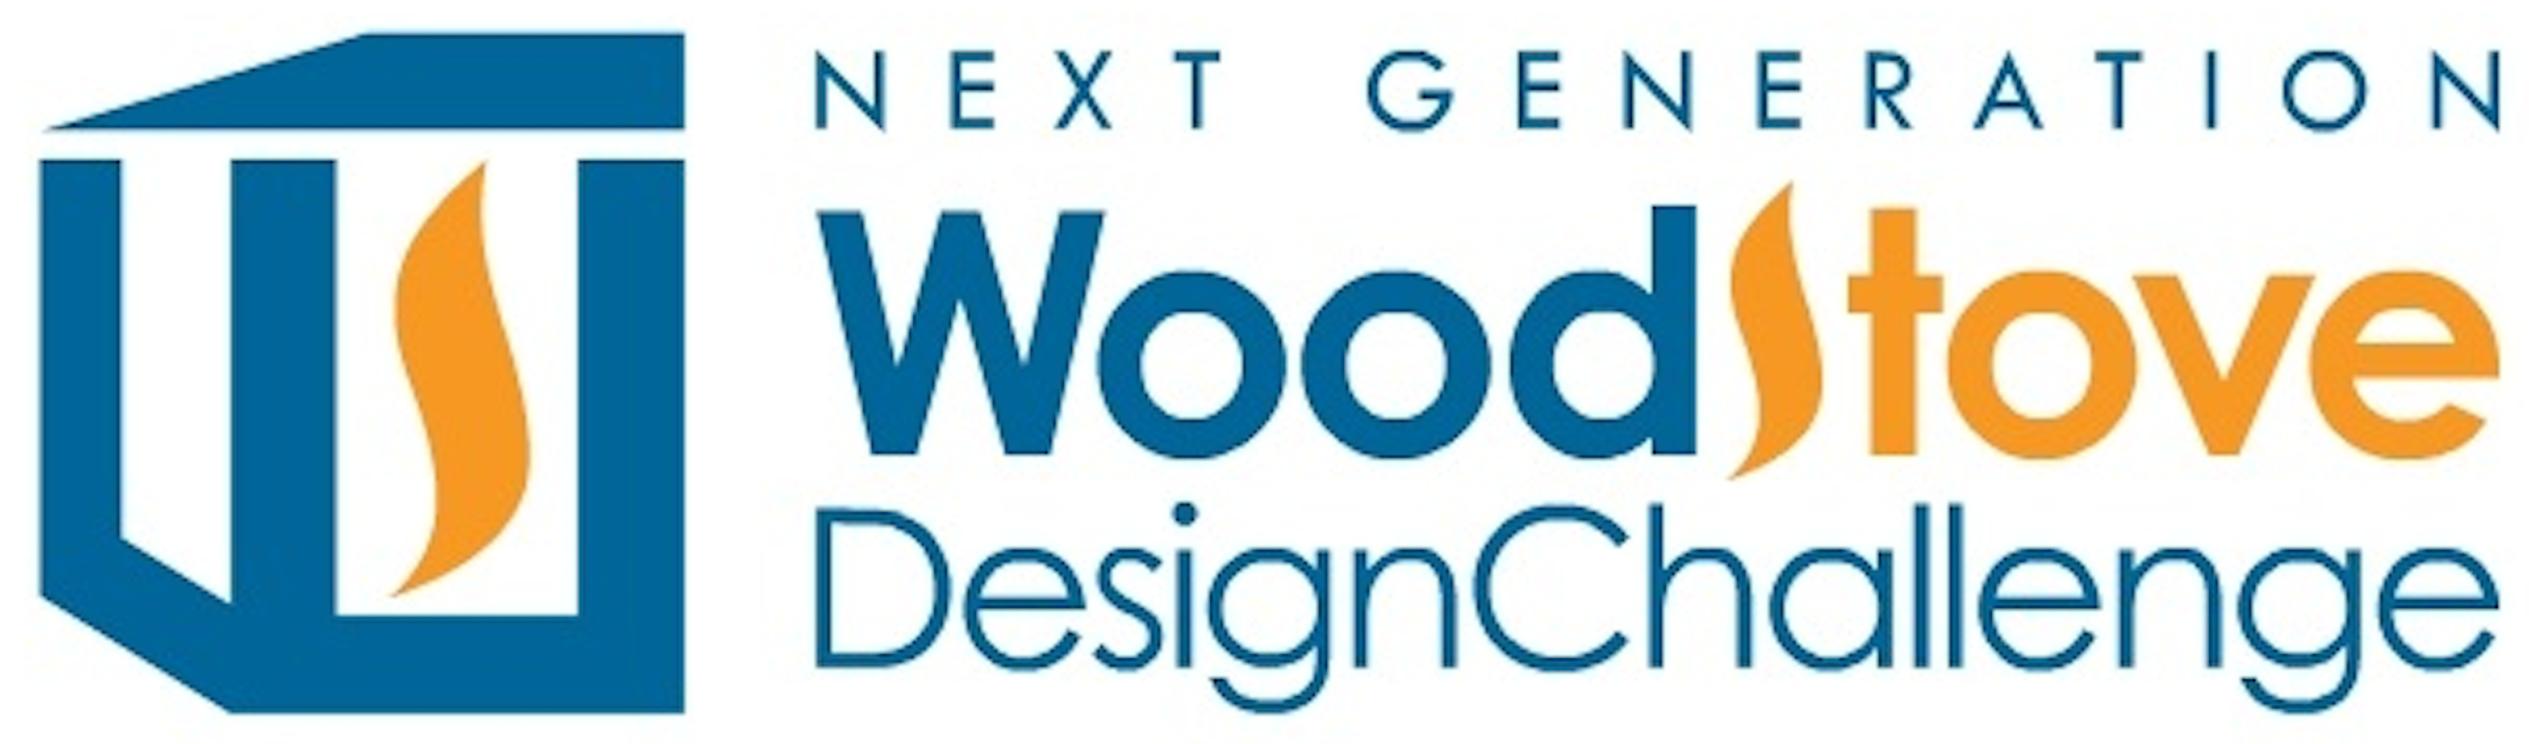 WoodStove Design Challenge